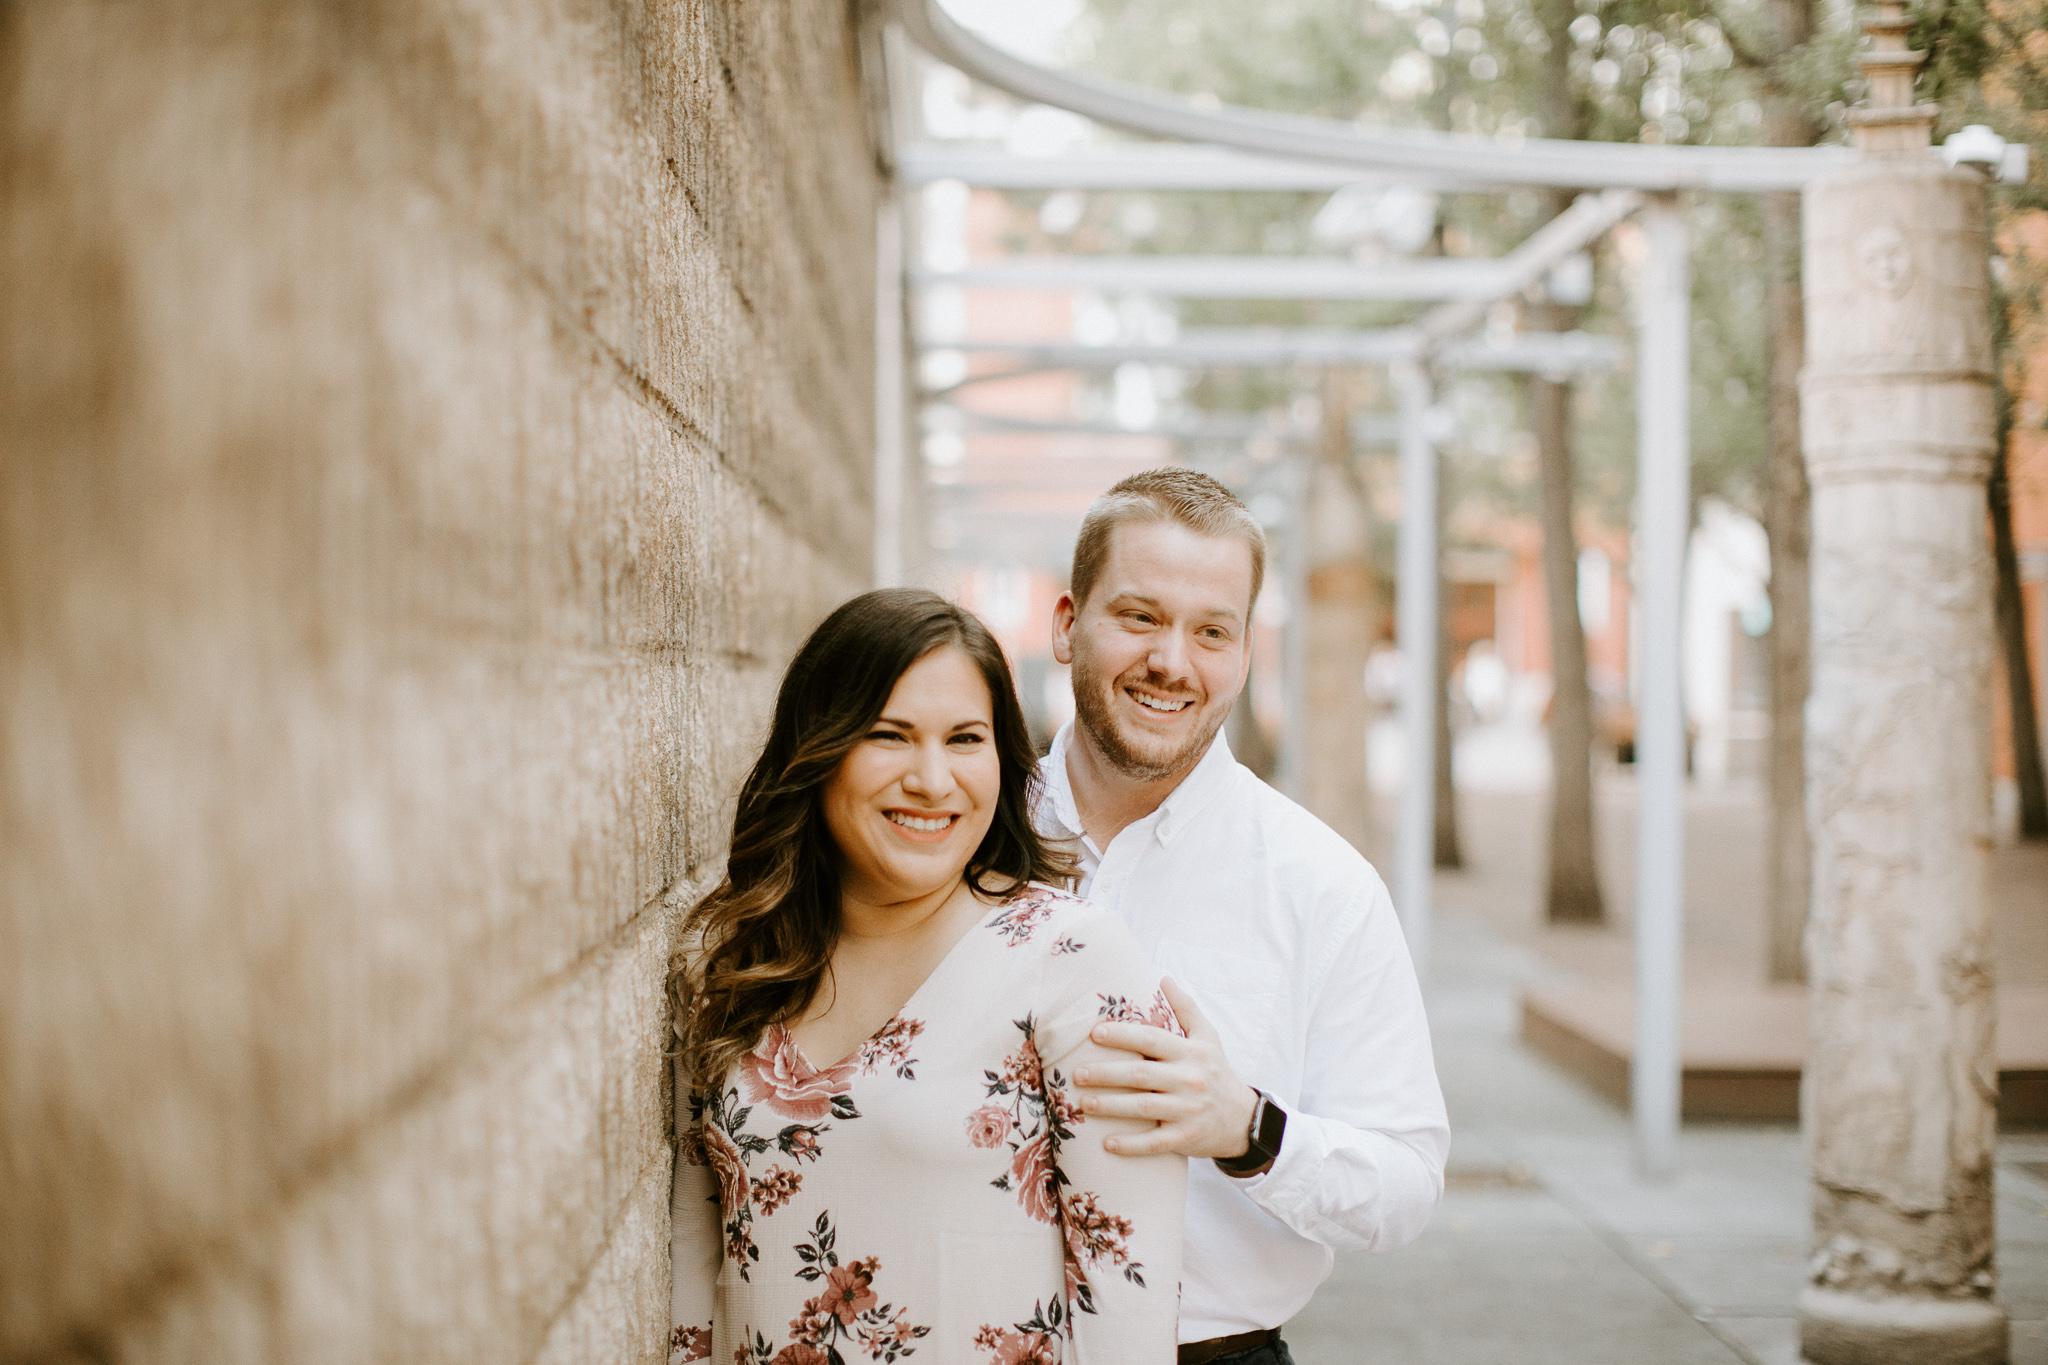 Engagement - Downtown Roanoke -  Wedding Photographer - Virginia - Best - Pat Cori Photography-12.jpg